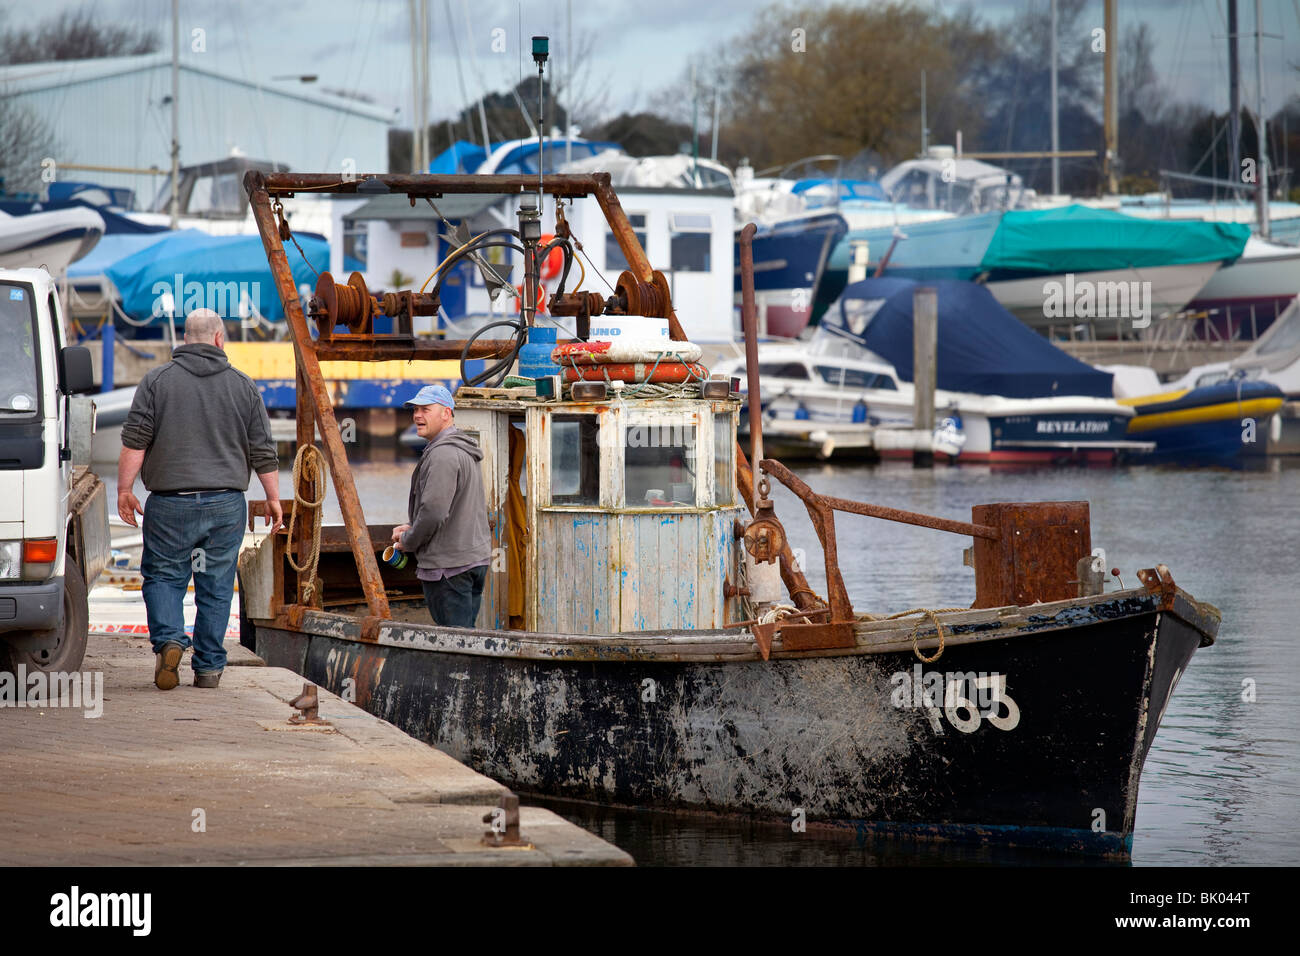 fisherman preparing a stern-trawler / shellfish dredger for inshore/coastal work - Stock Image